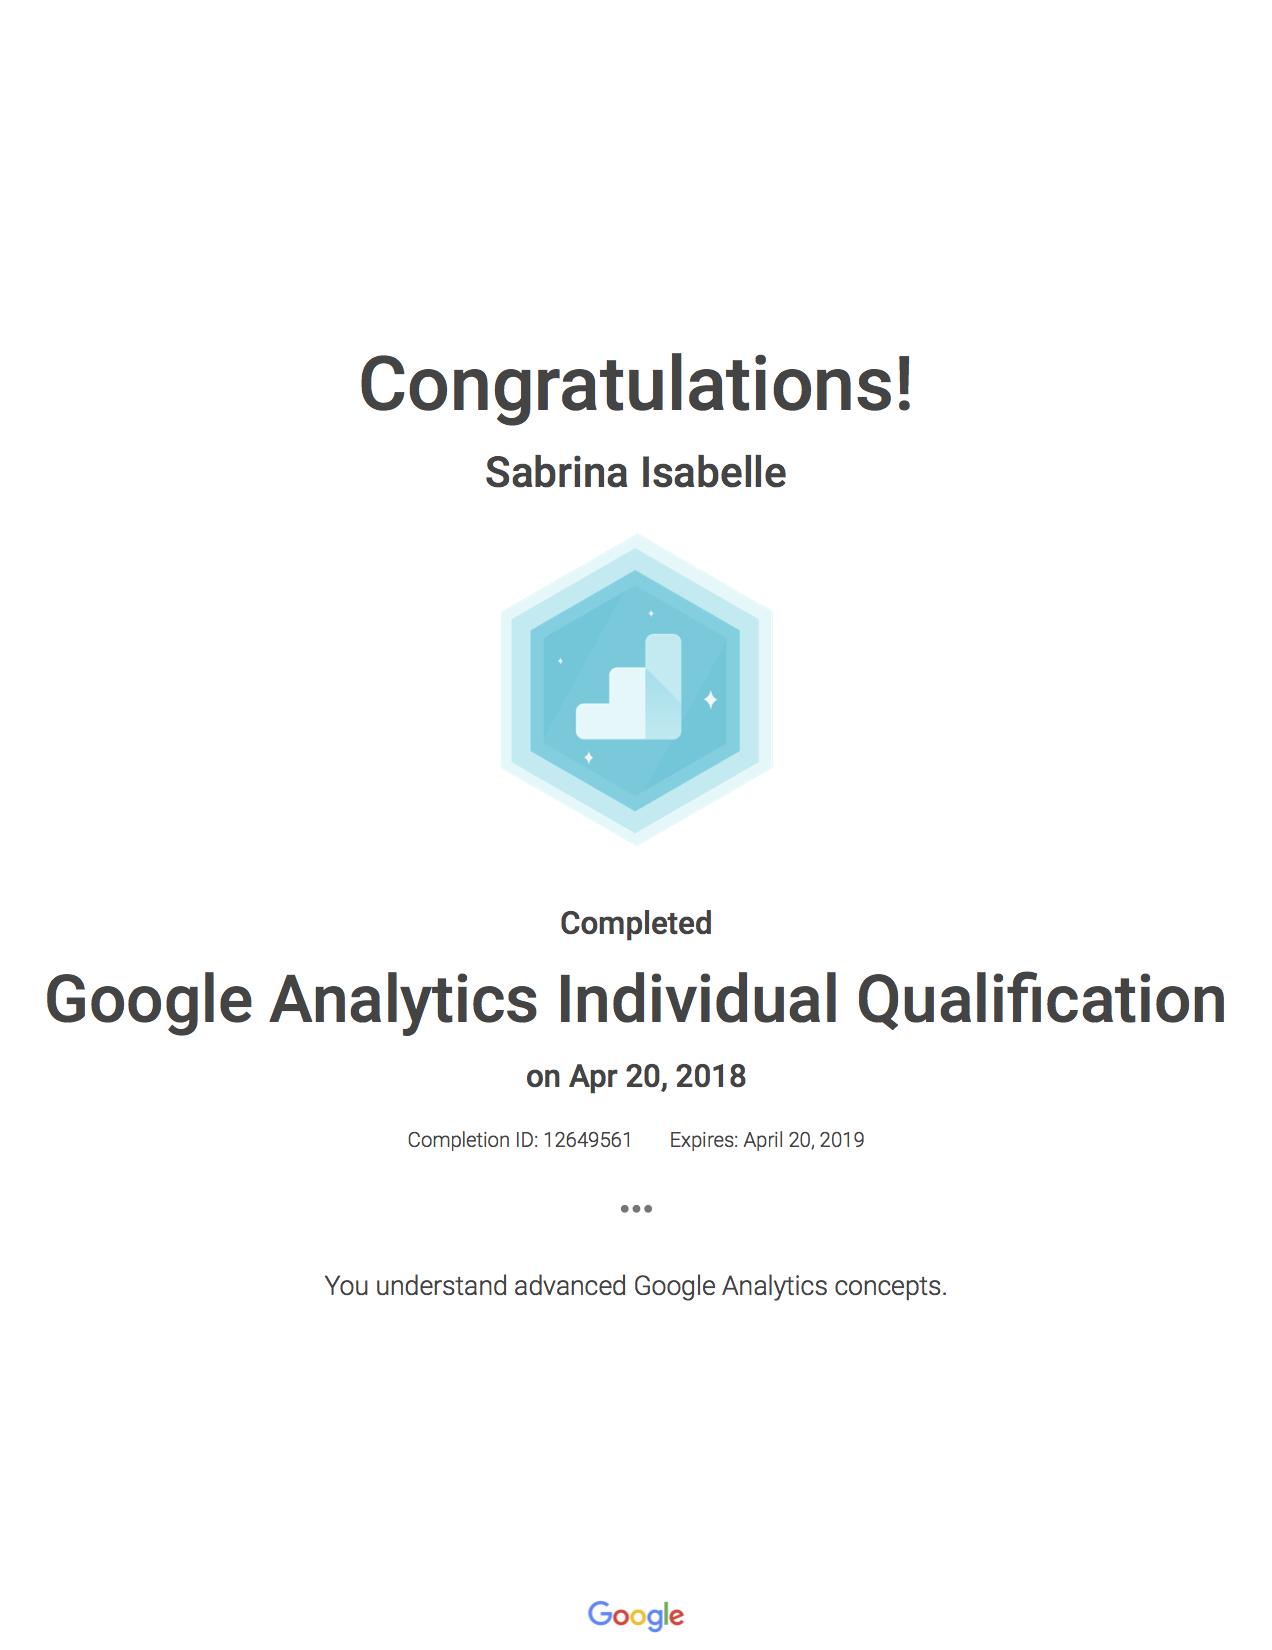 Google Analytics Individual Qualification.png